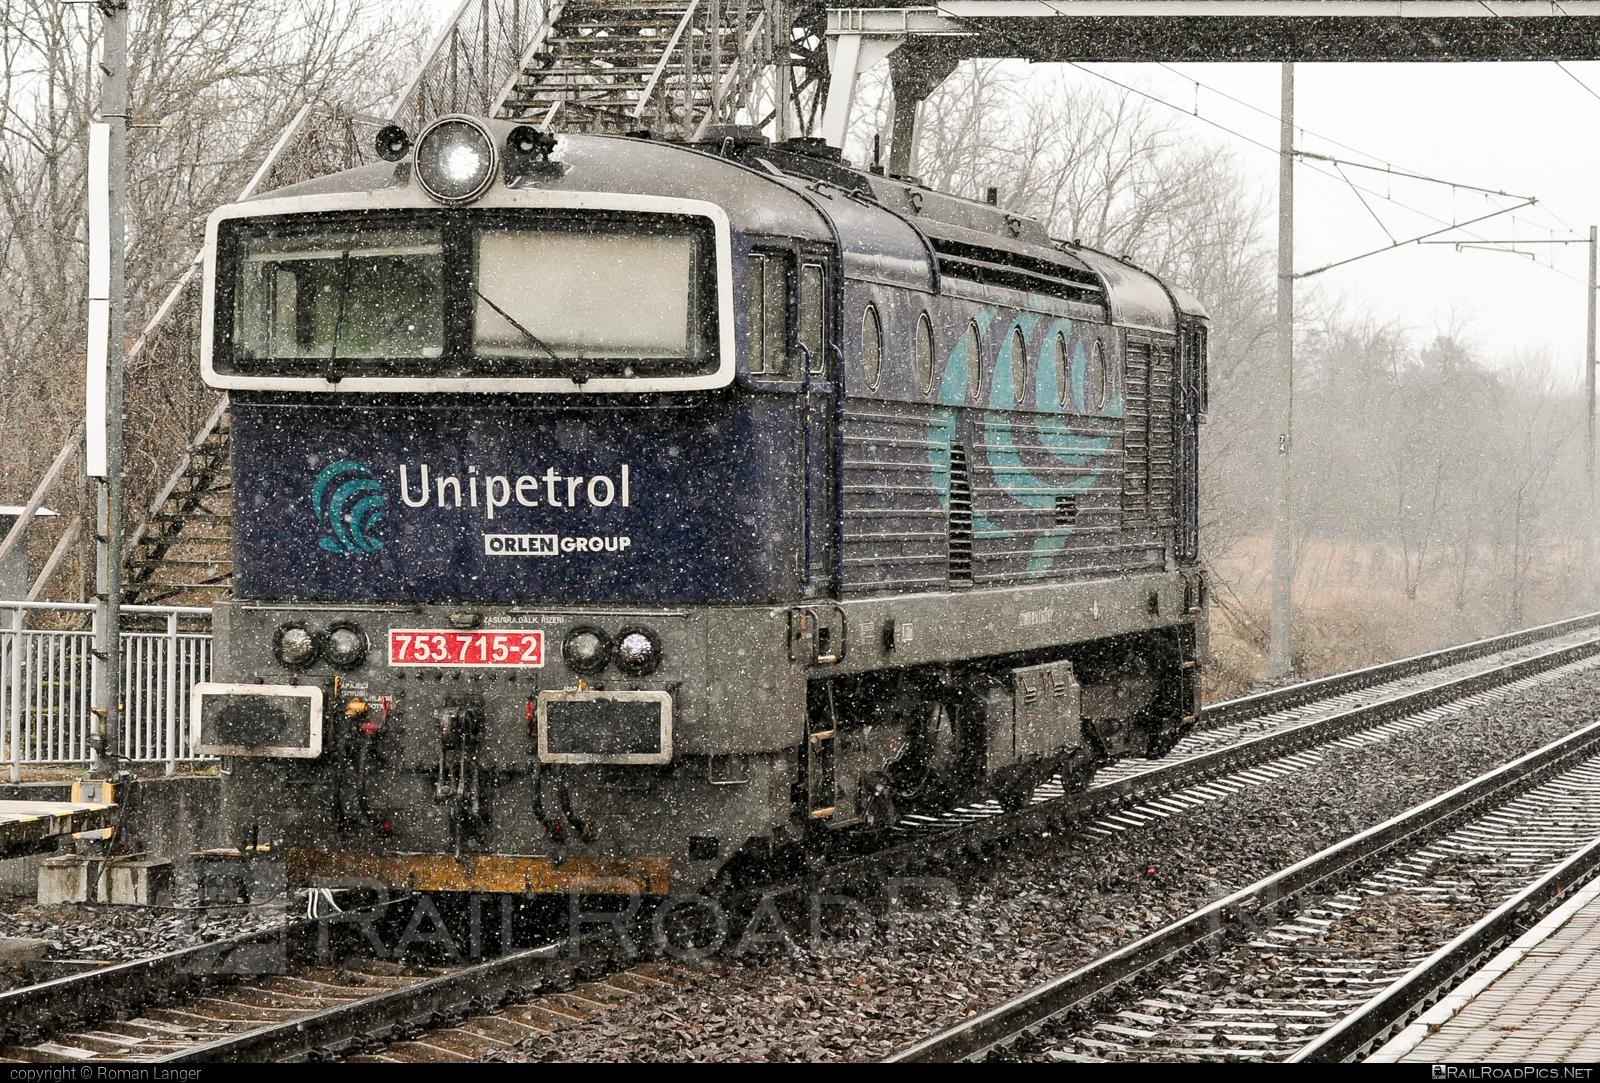 ČKD T 478.3 (753) - 753 715-2 operated by UNIPETROL DOPRAVA, a.s. #brejlovec #ckd #ckdclass753 #ckdt4783 #locomotive753 #okuliarnik #unipetrol